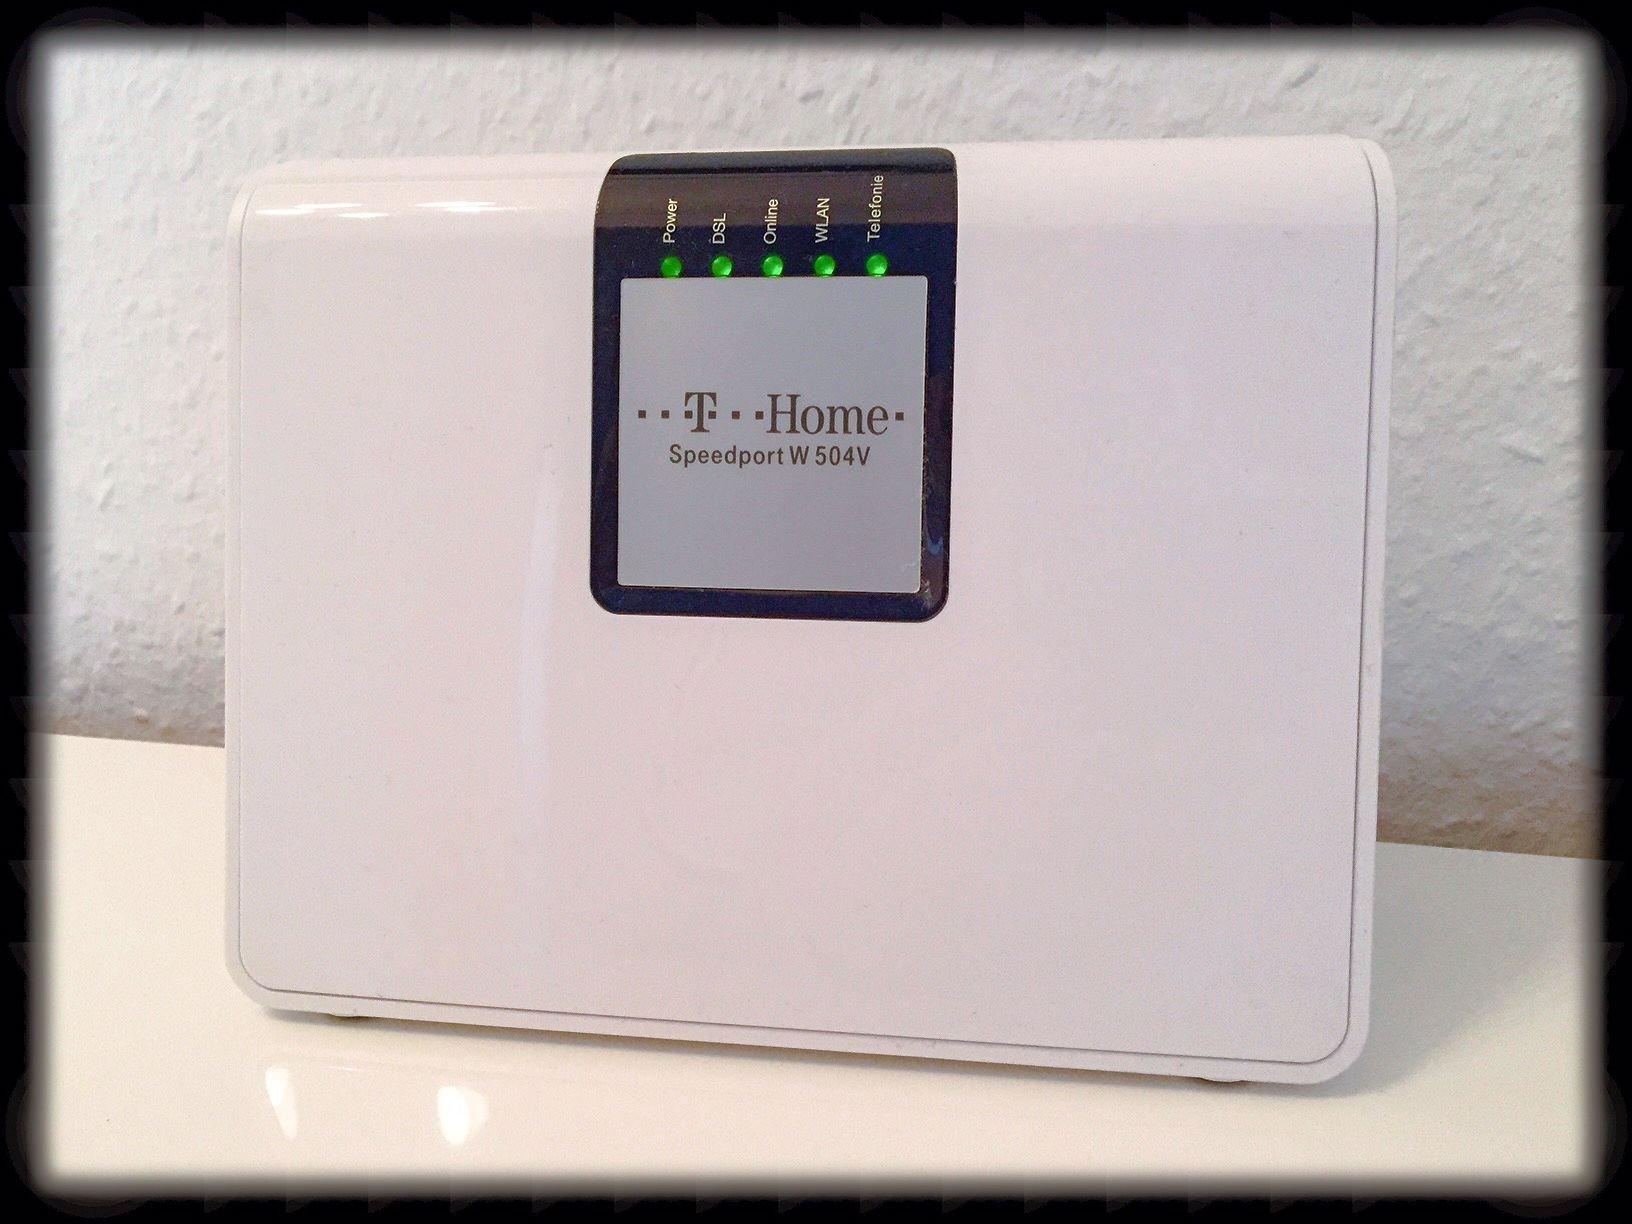 iPhone 6 mit WLAN-Router verbinden (Anleitung, Teil 12) - Mobil-ganz ...